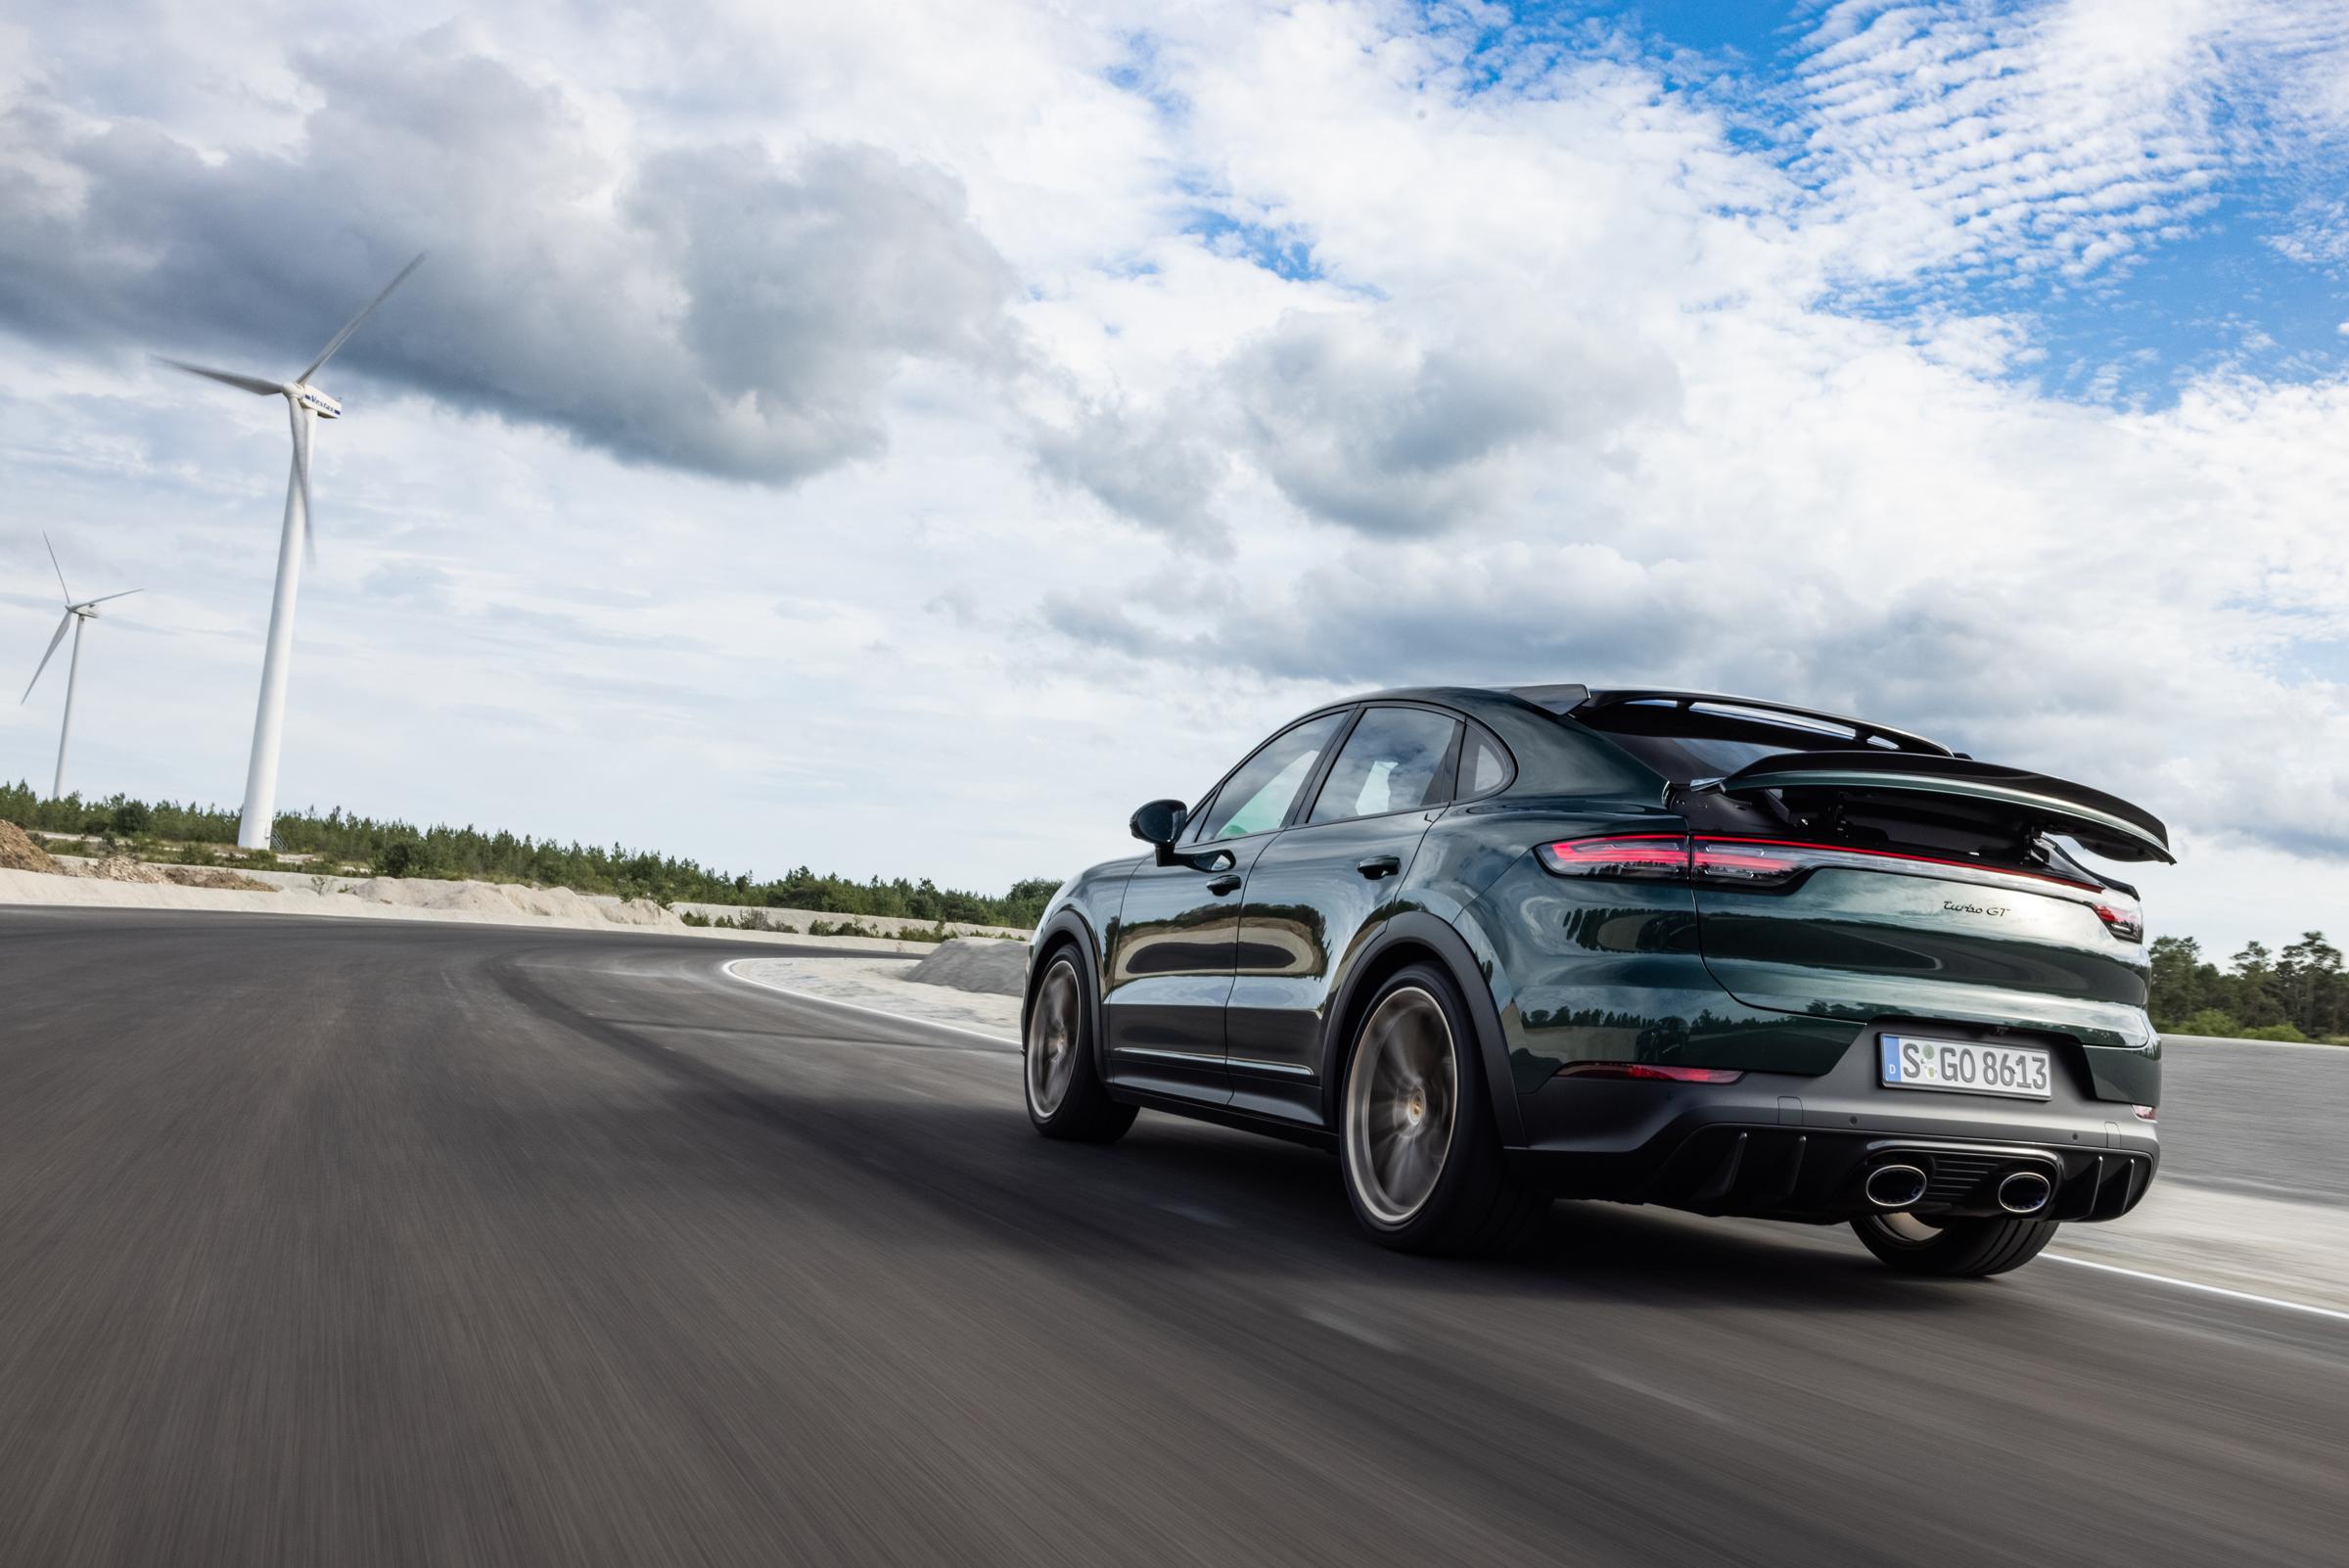 Porsche-Cayenne-Turbo-GT-Dynamic-Rear